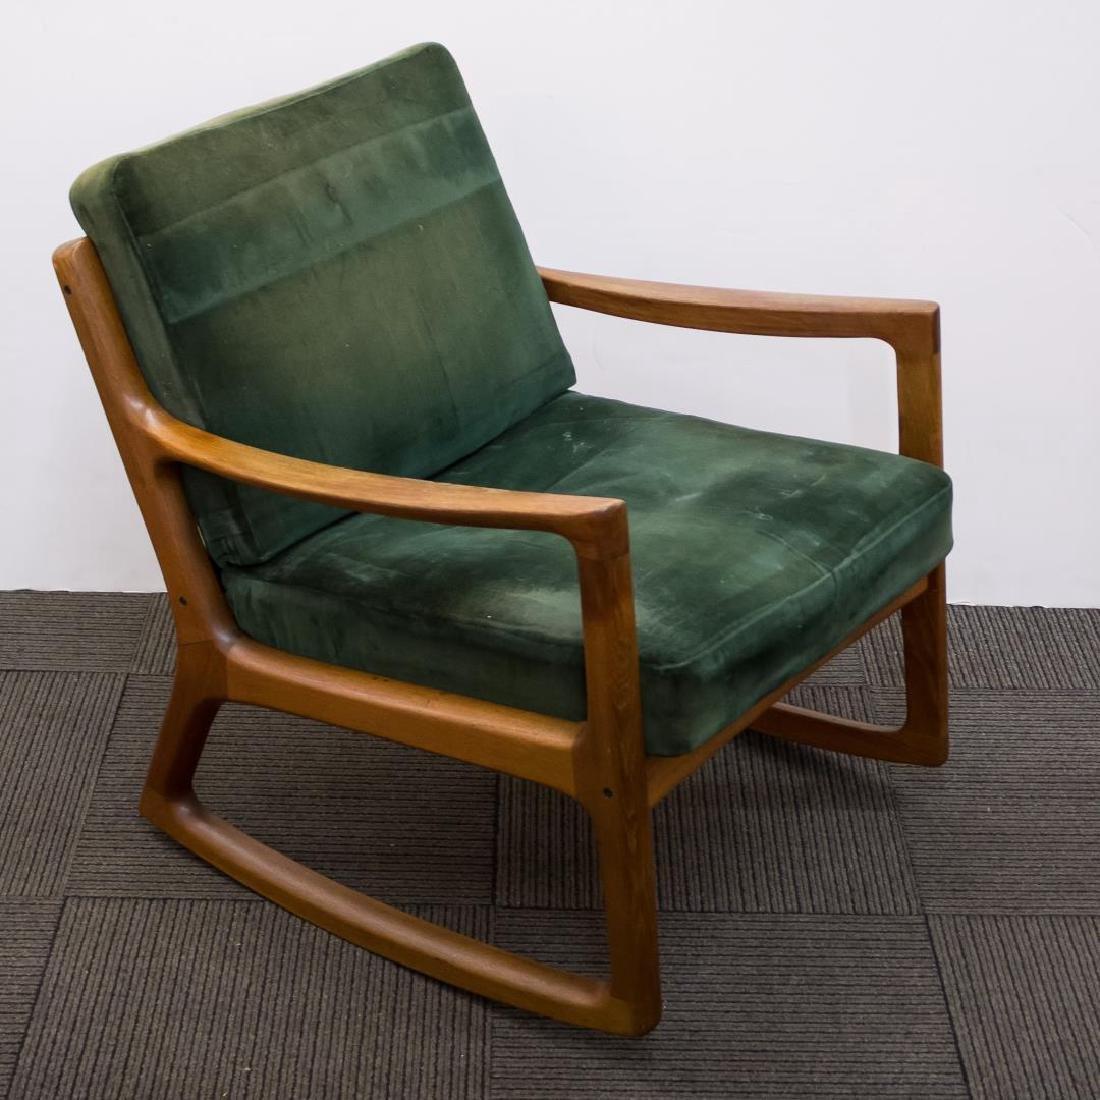 Ole Wanscher Danish Modern Teakwood Rocking Chair